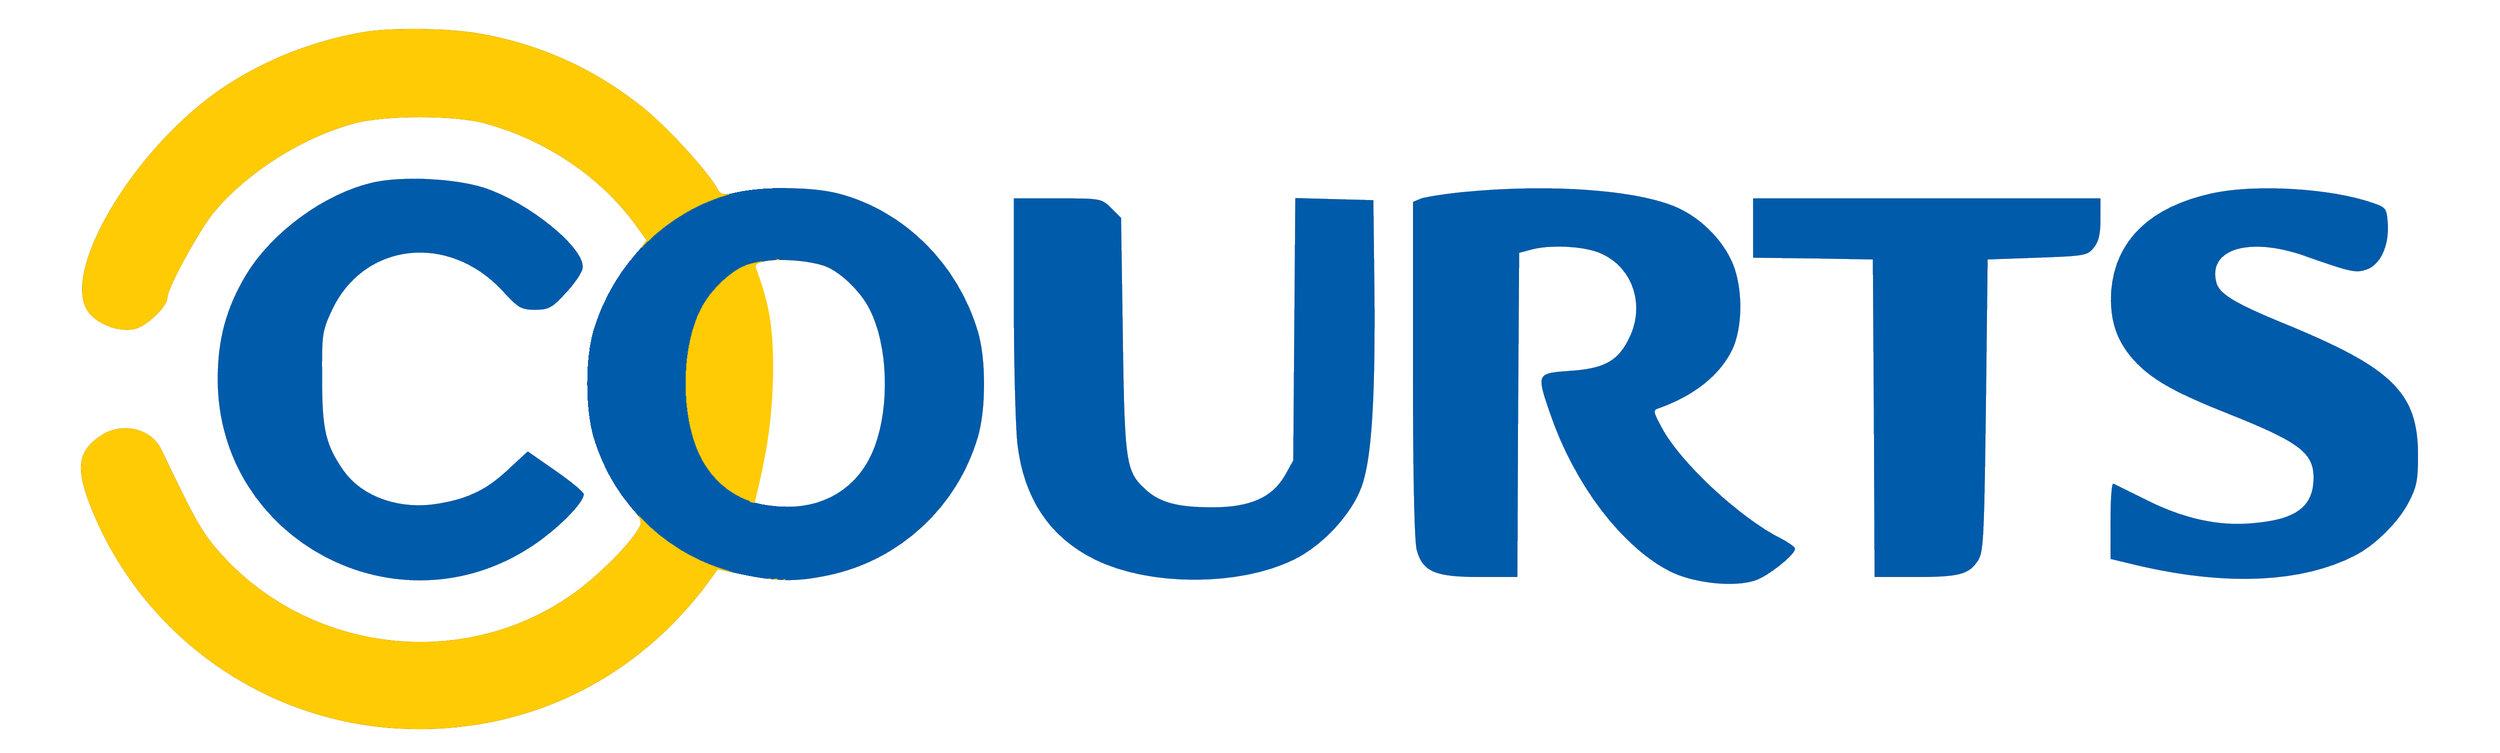 Courts_logo.jpg